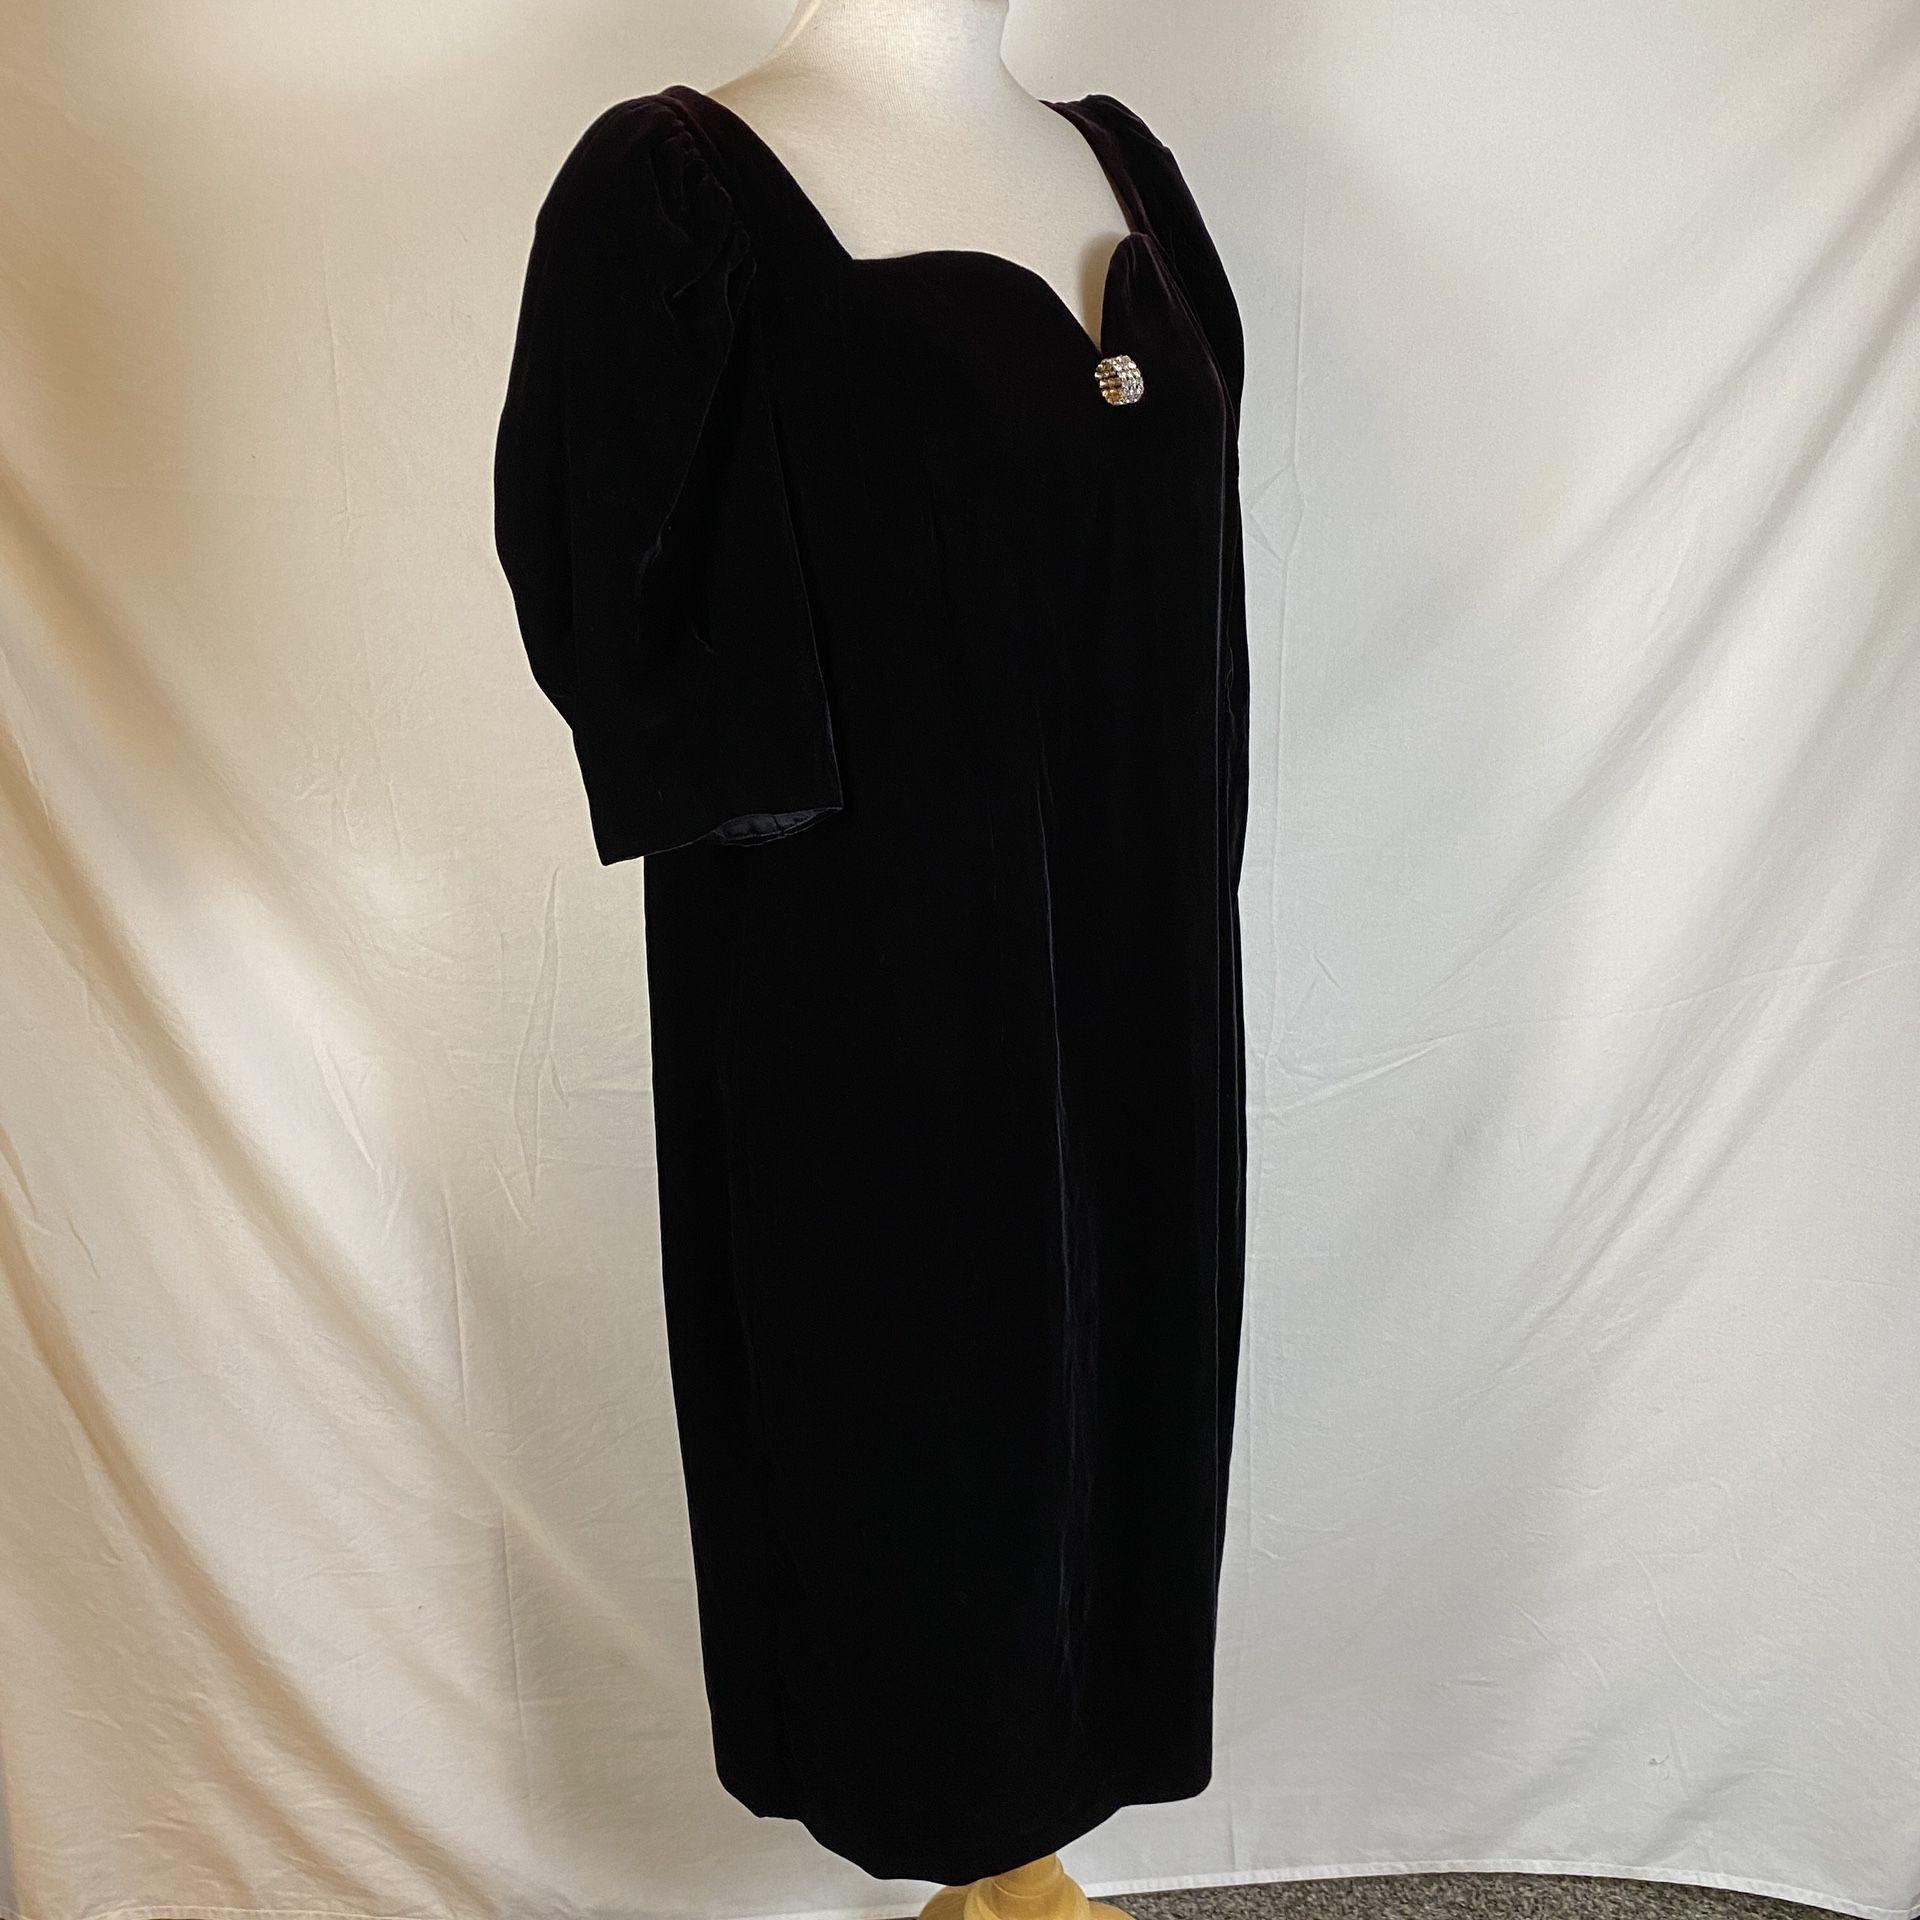 Vintage 80s Black Velvet Formal Prom Party Dress Cachet by Bari Protas Size 16